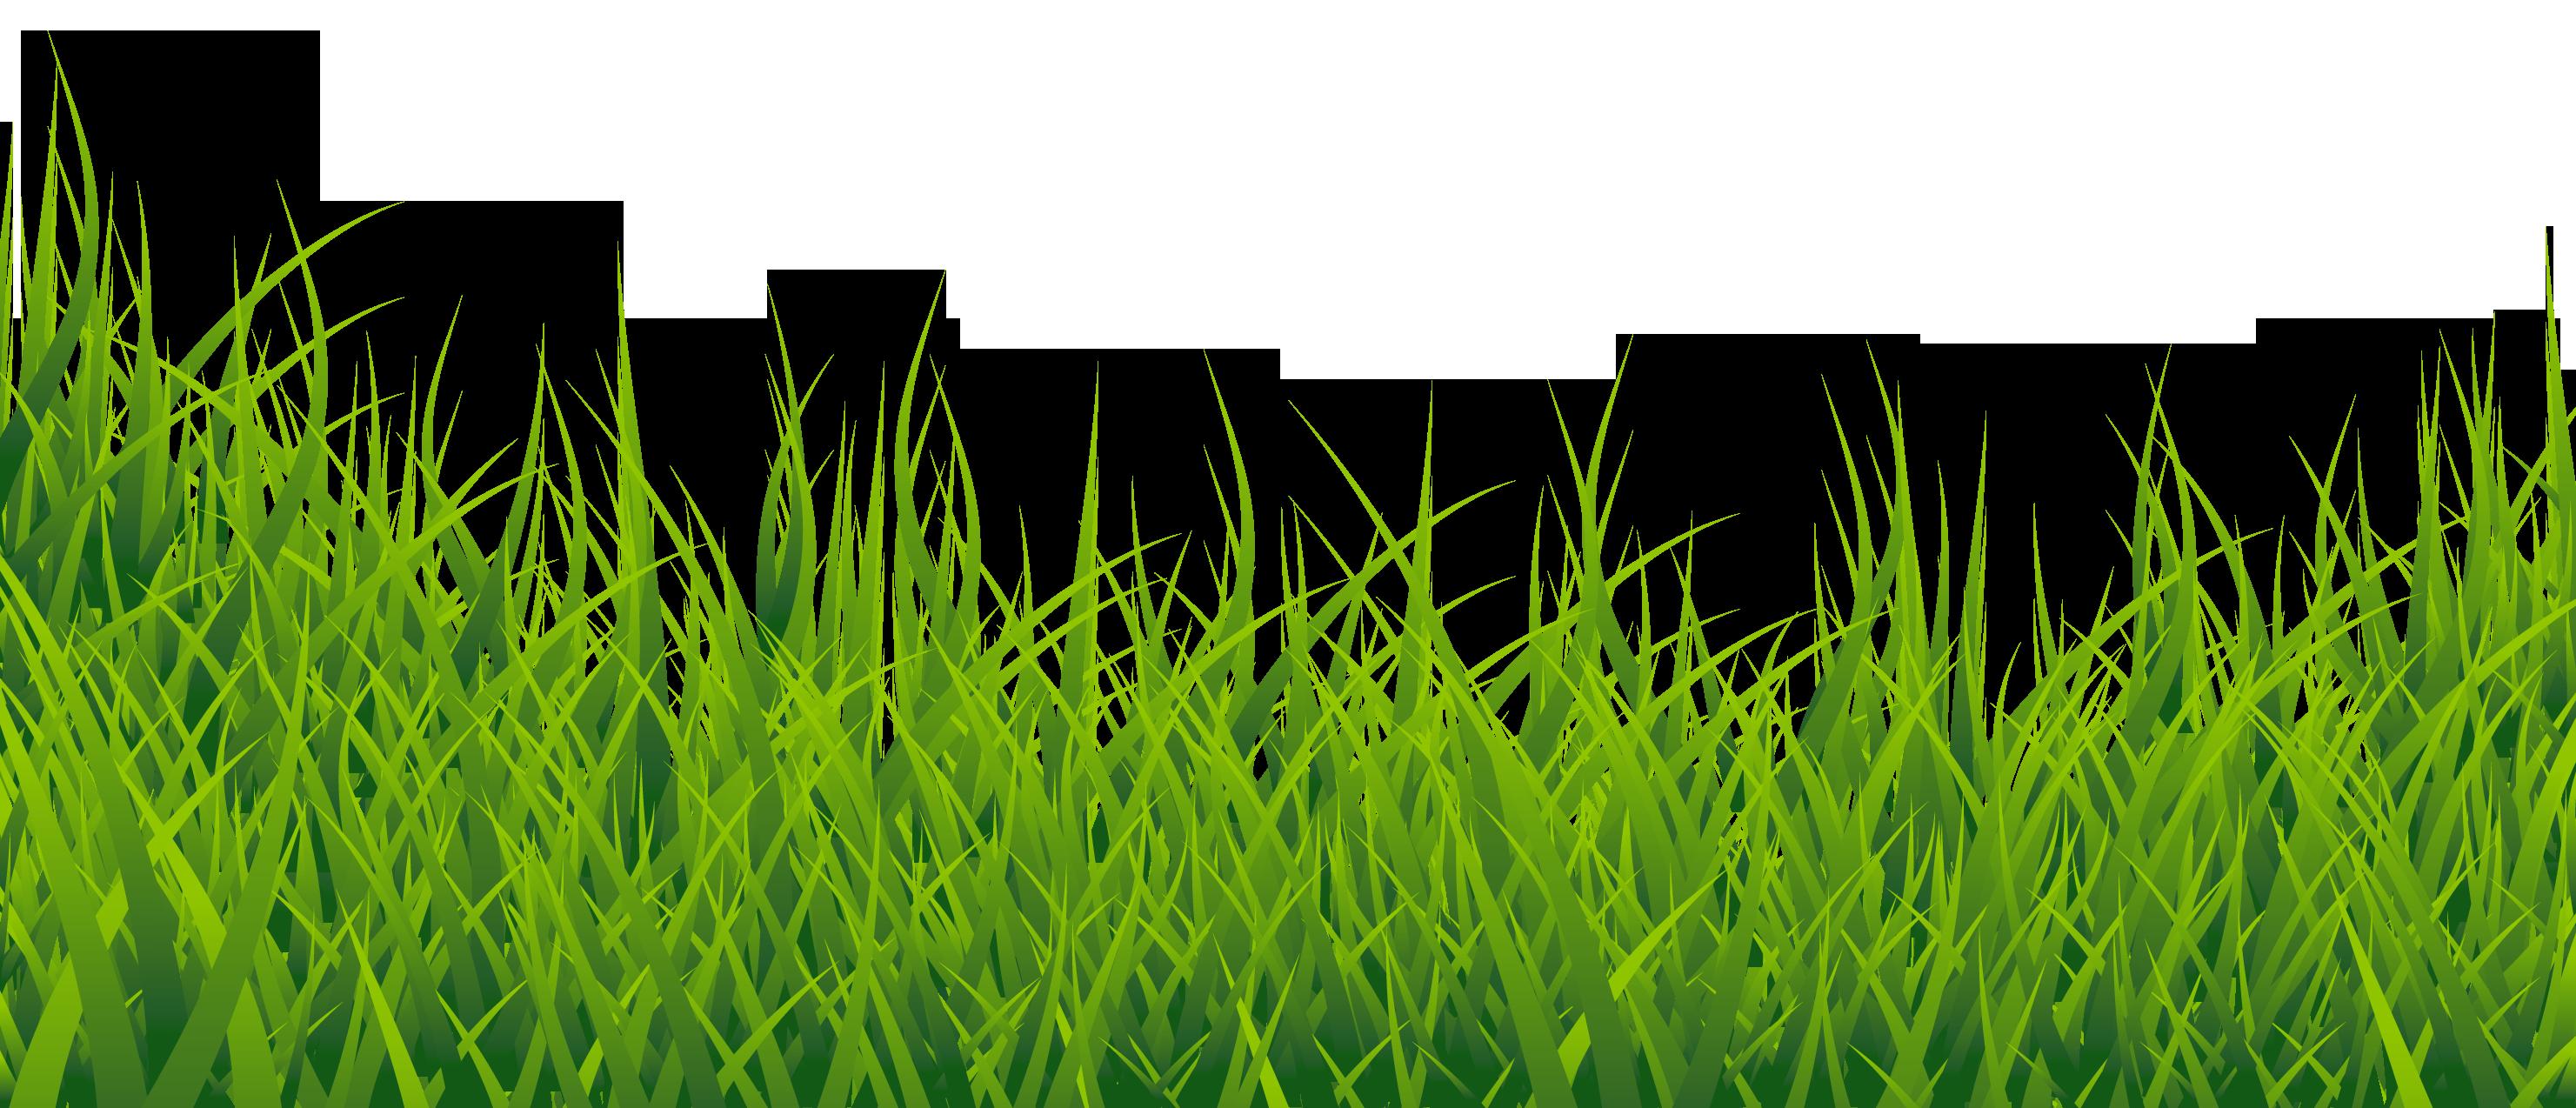 Clipart grass jpeg. Hd png transparent image